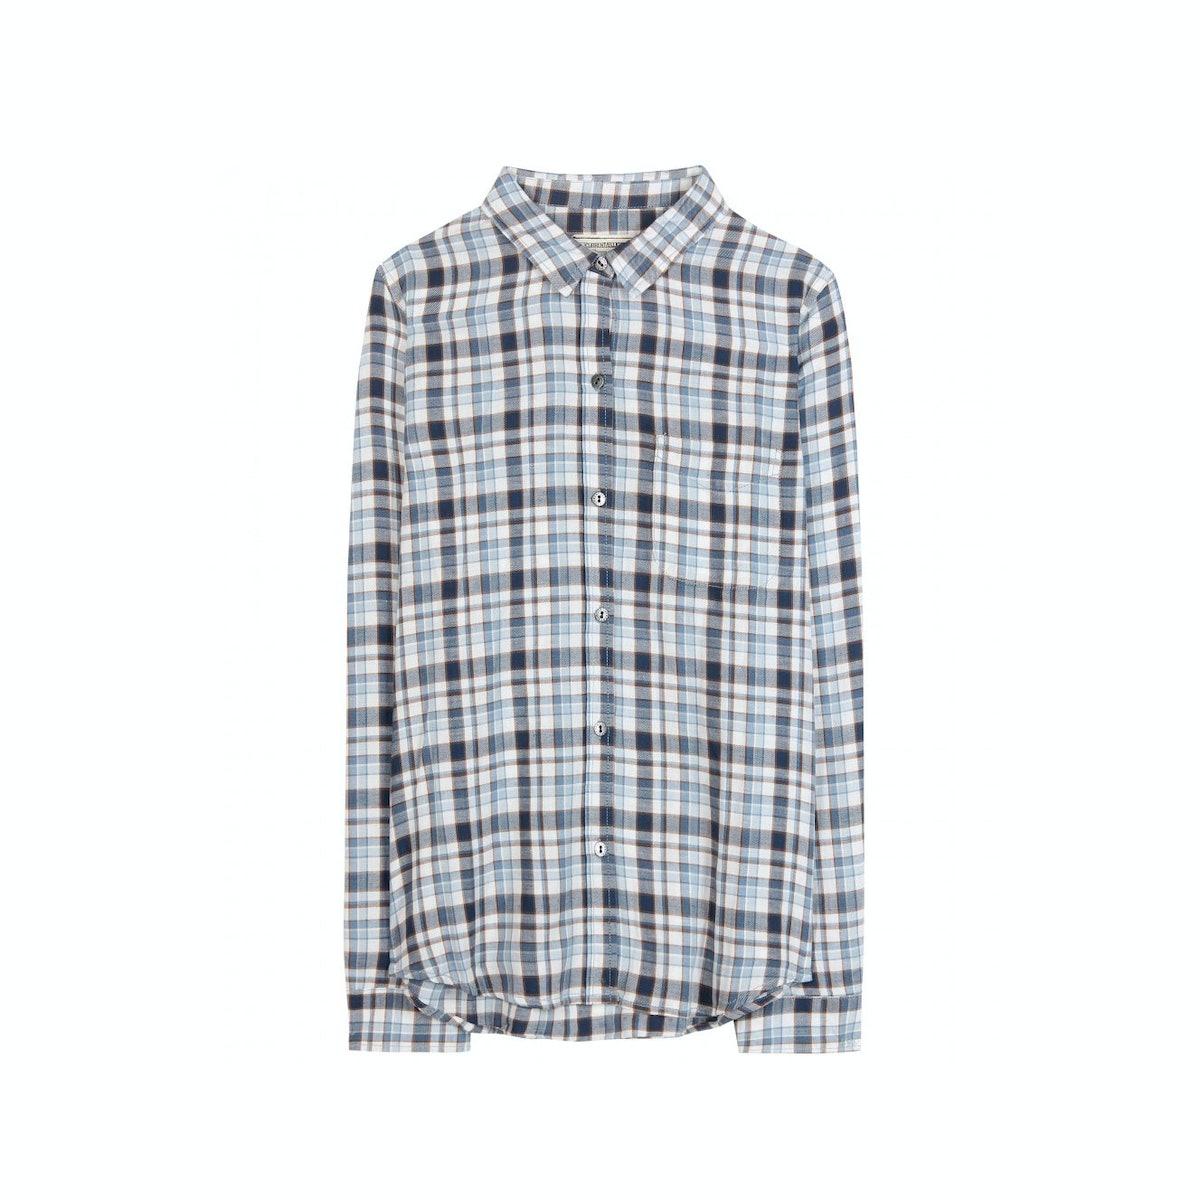 Current/Elliot plaid shirt